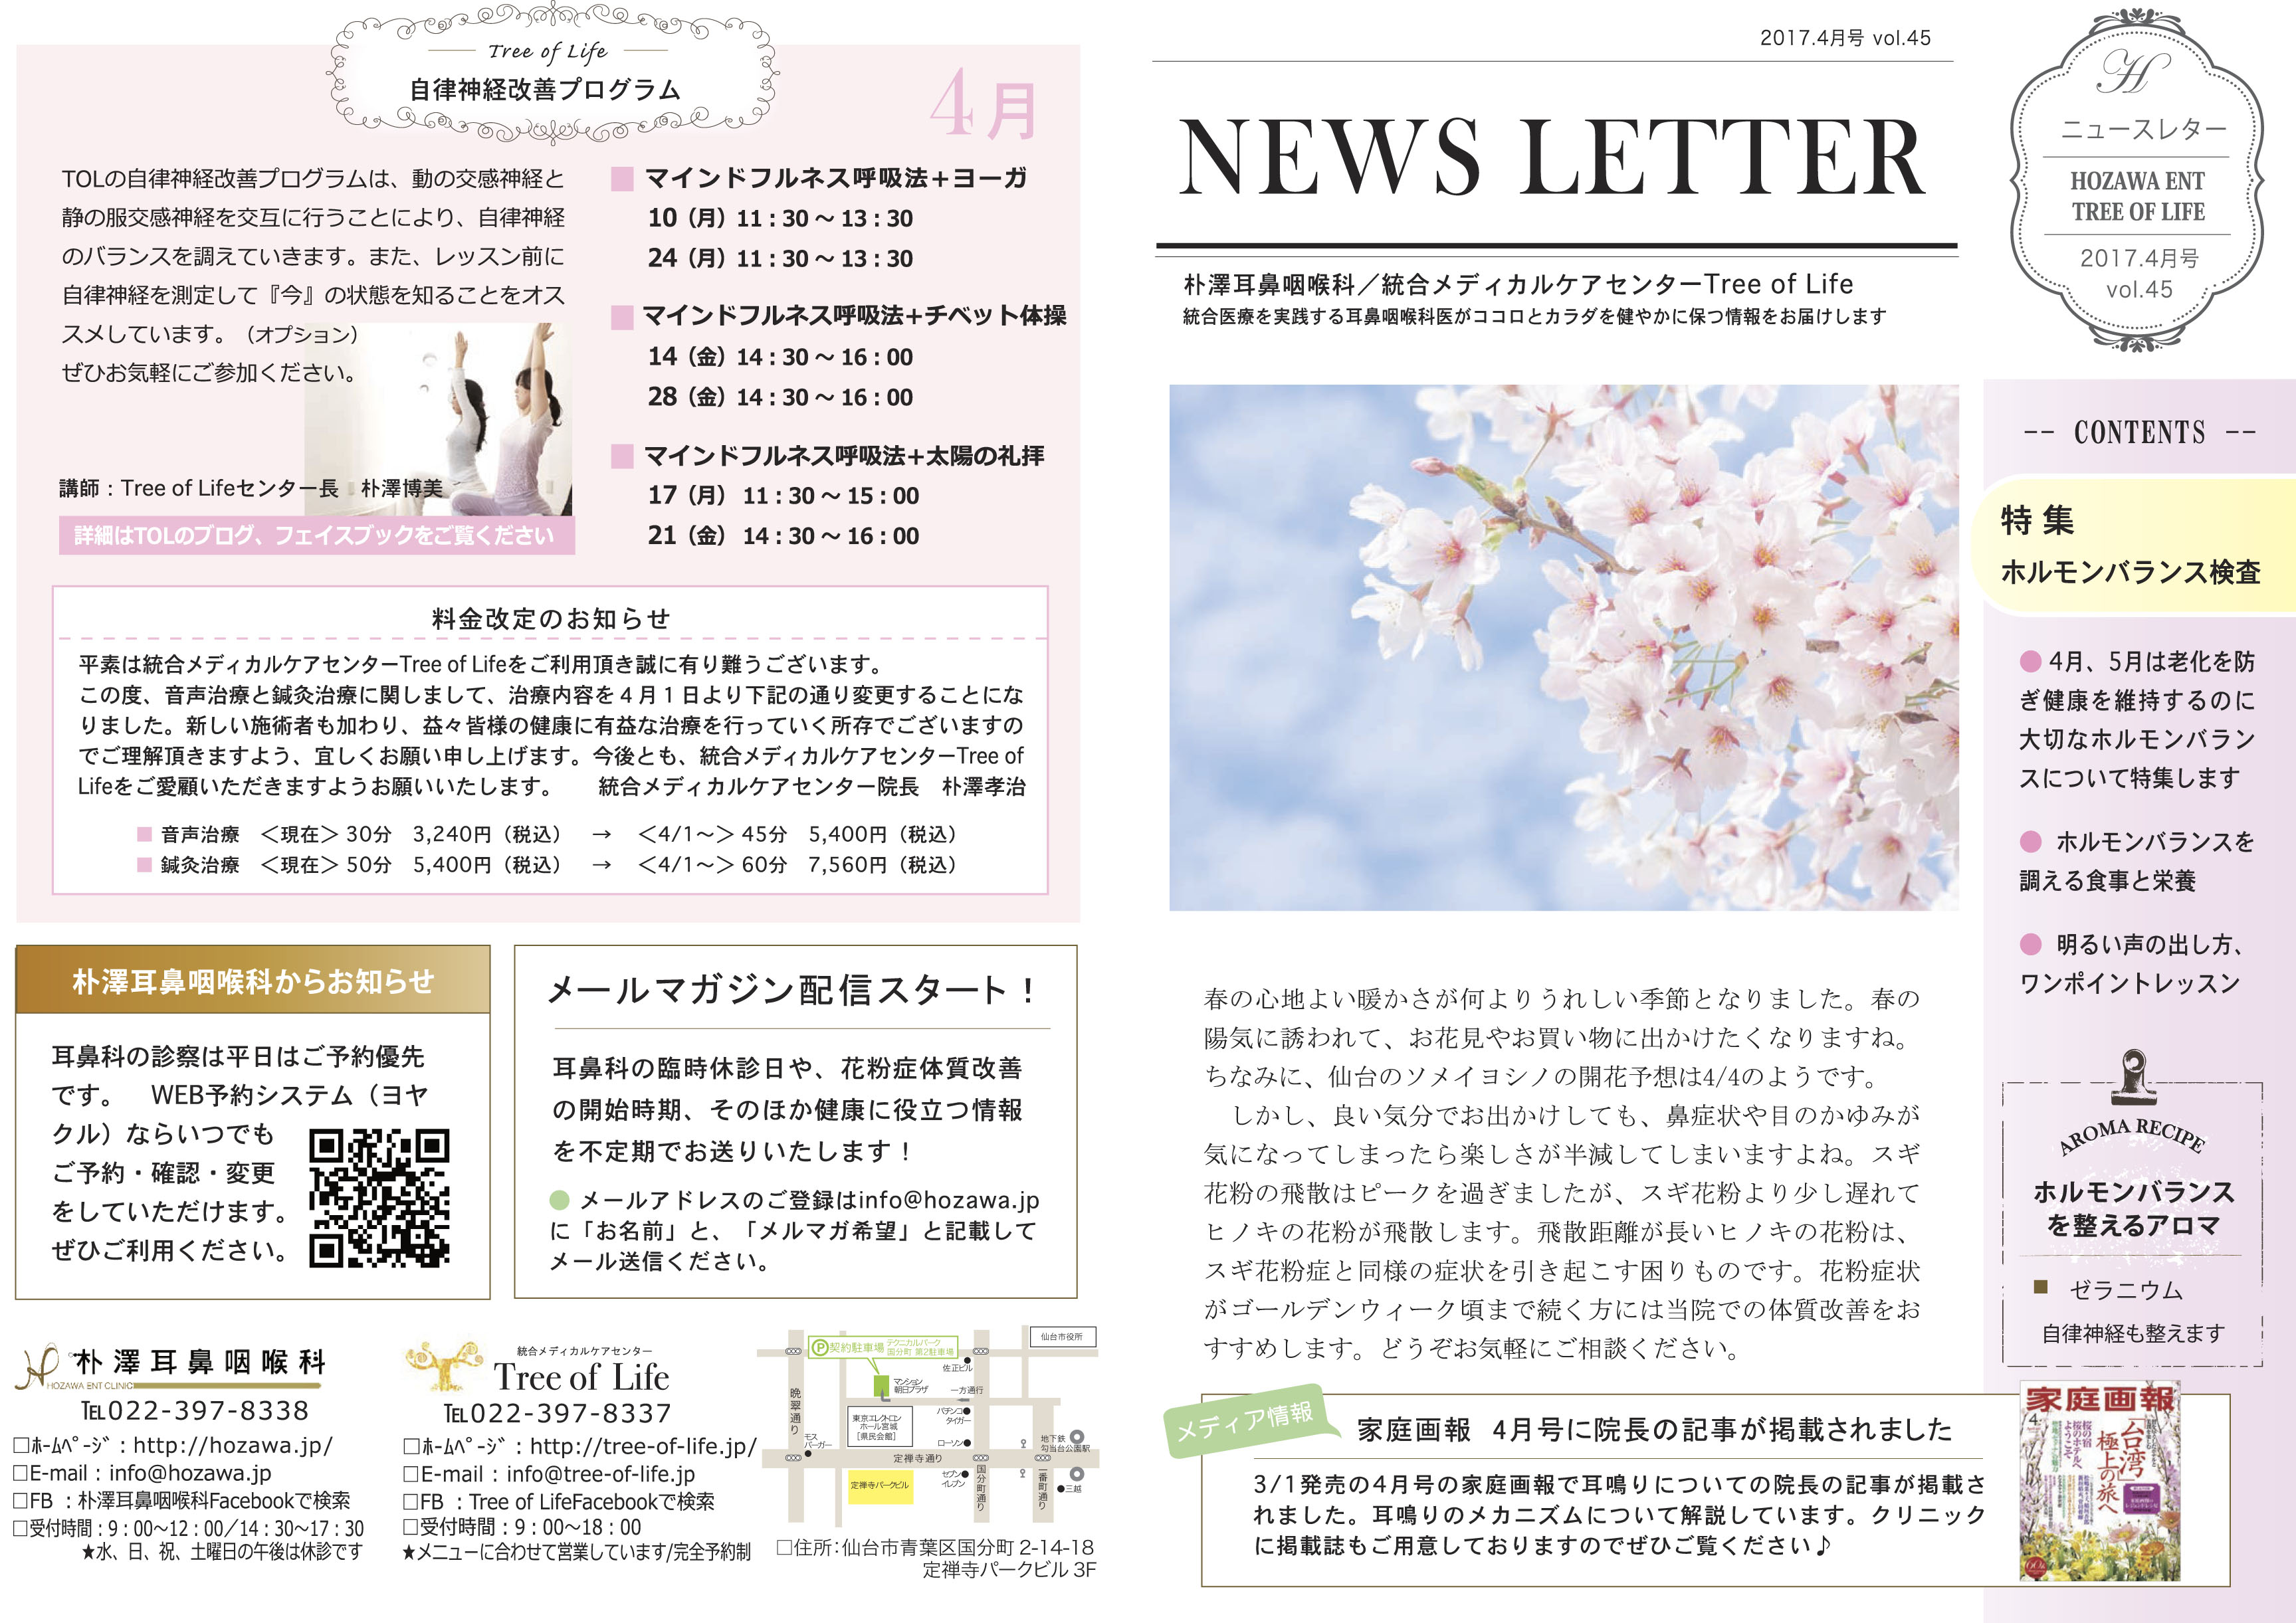 http://hozawa.jp/news/news_img/1703305494_01L-1.jpg